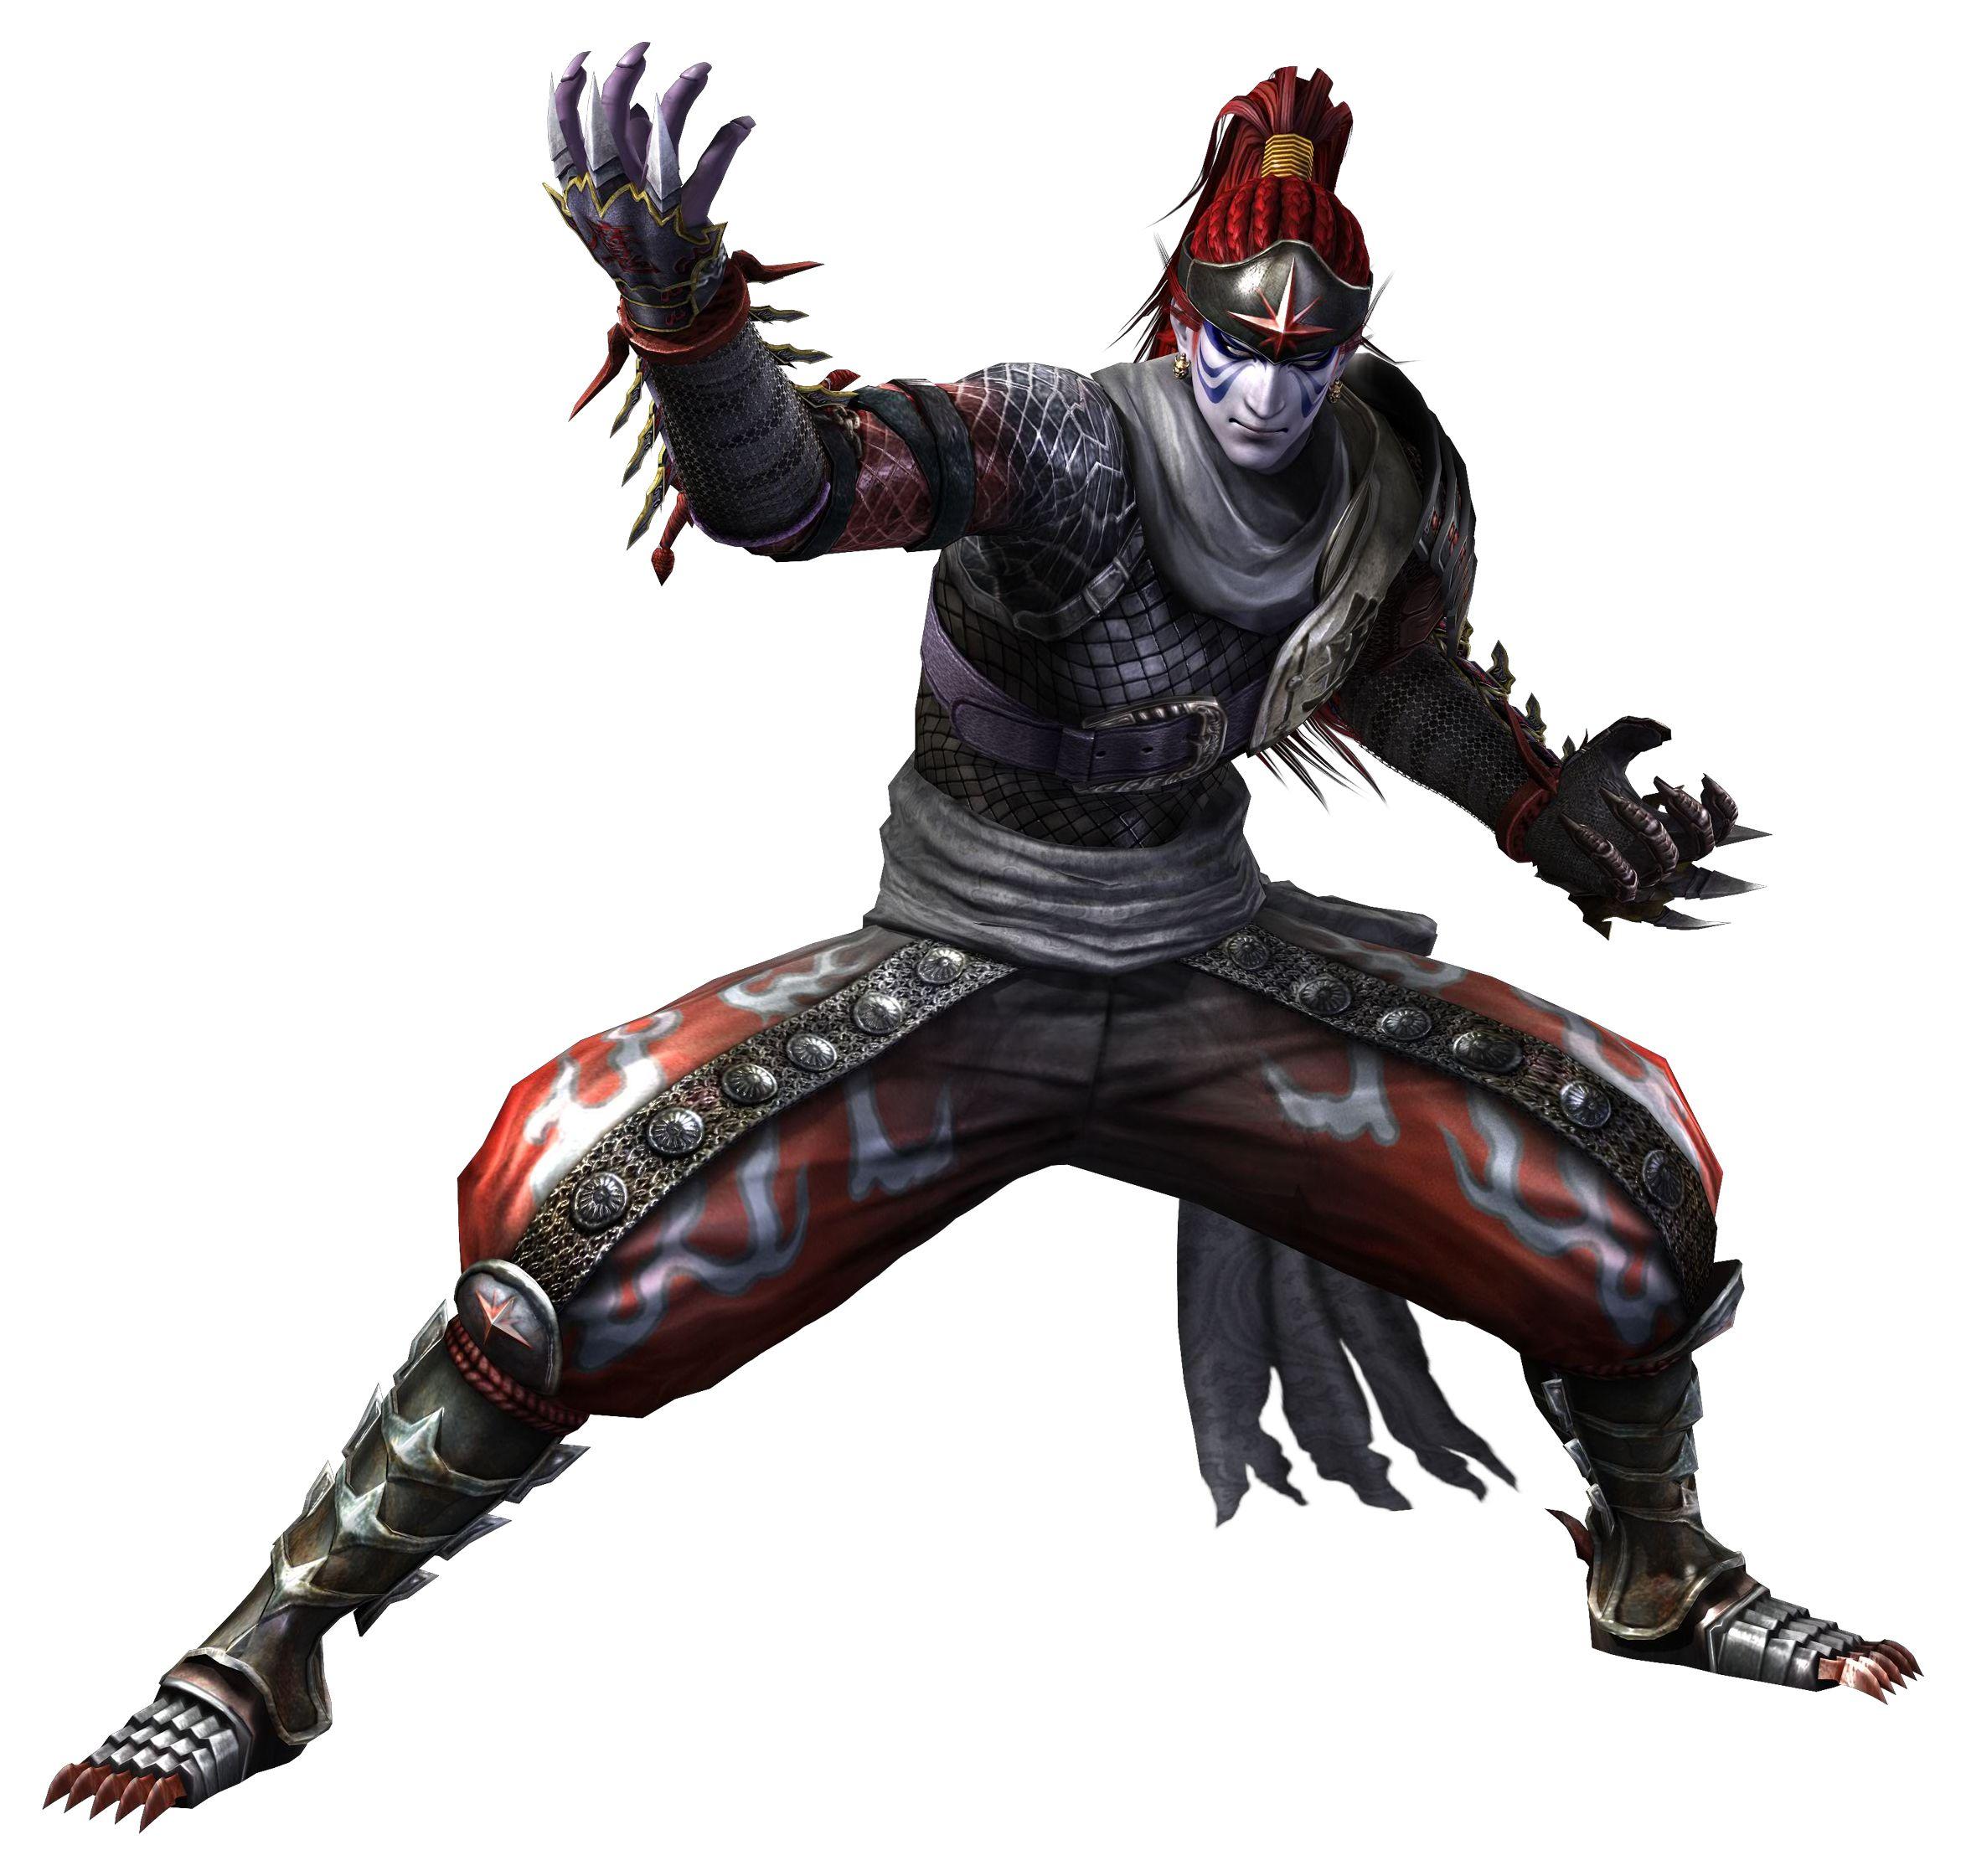 Warriors Orochi 3 Character List: Orochi Soldier In Warriors Orochi 2